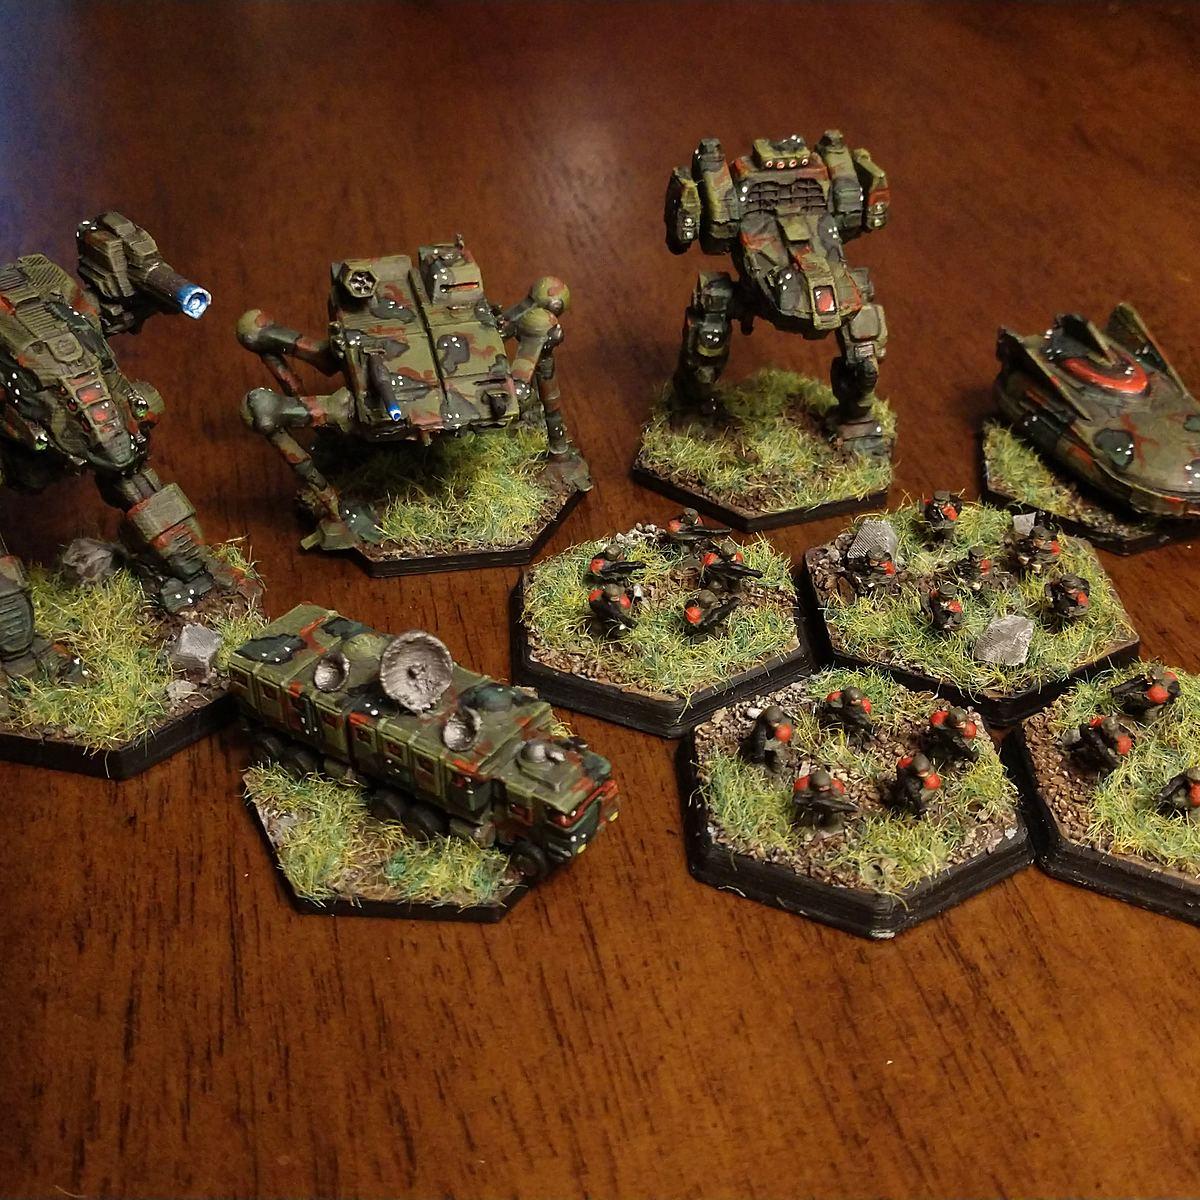 Battletech: Alpine Camo